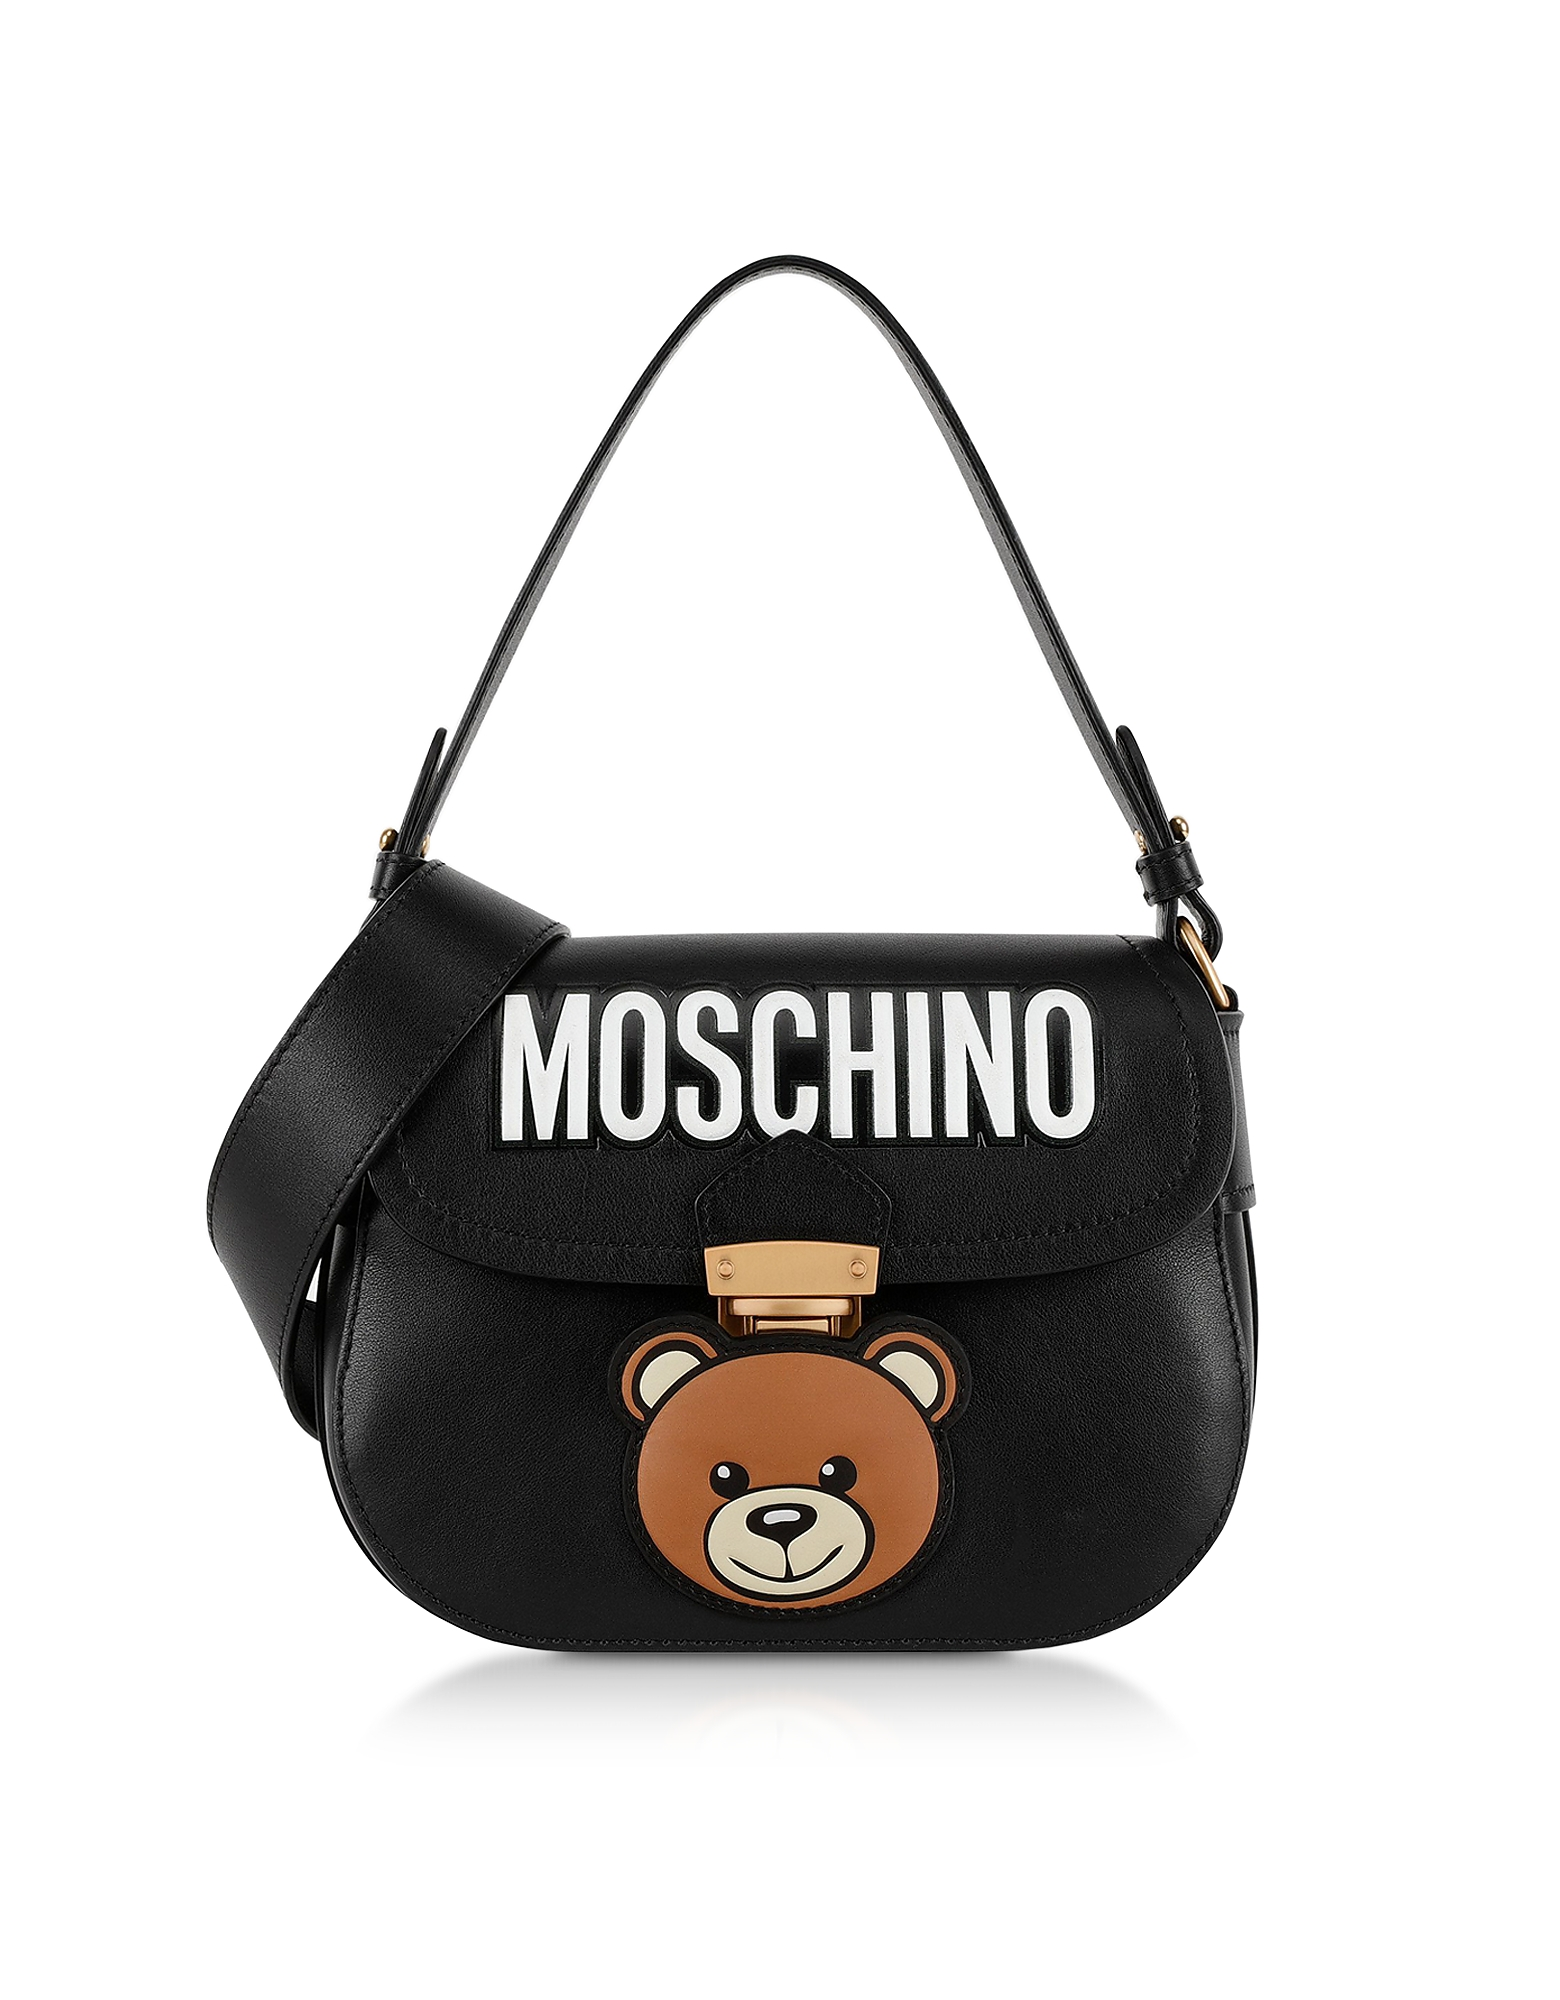 ed8978ce20a Moschino Designer Handbags, Black Leather Teddy Bear Shoulder Bag. FORZIERI